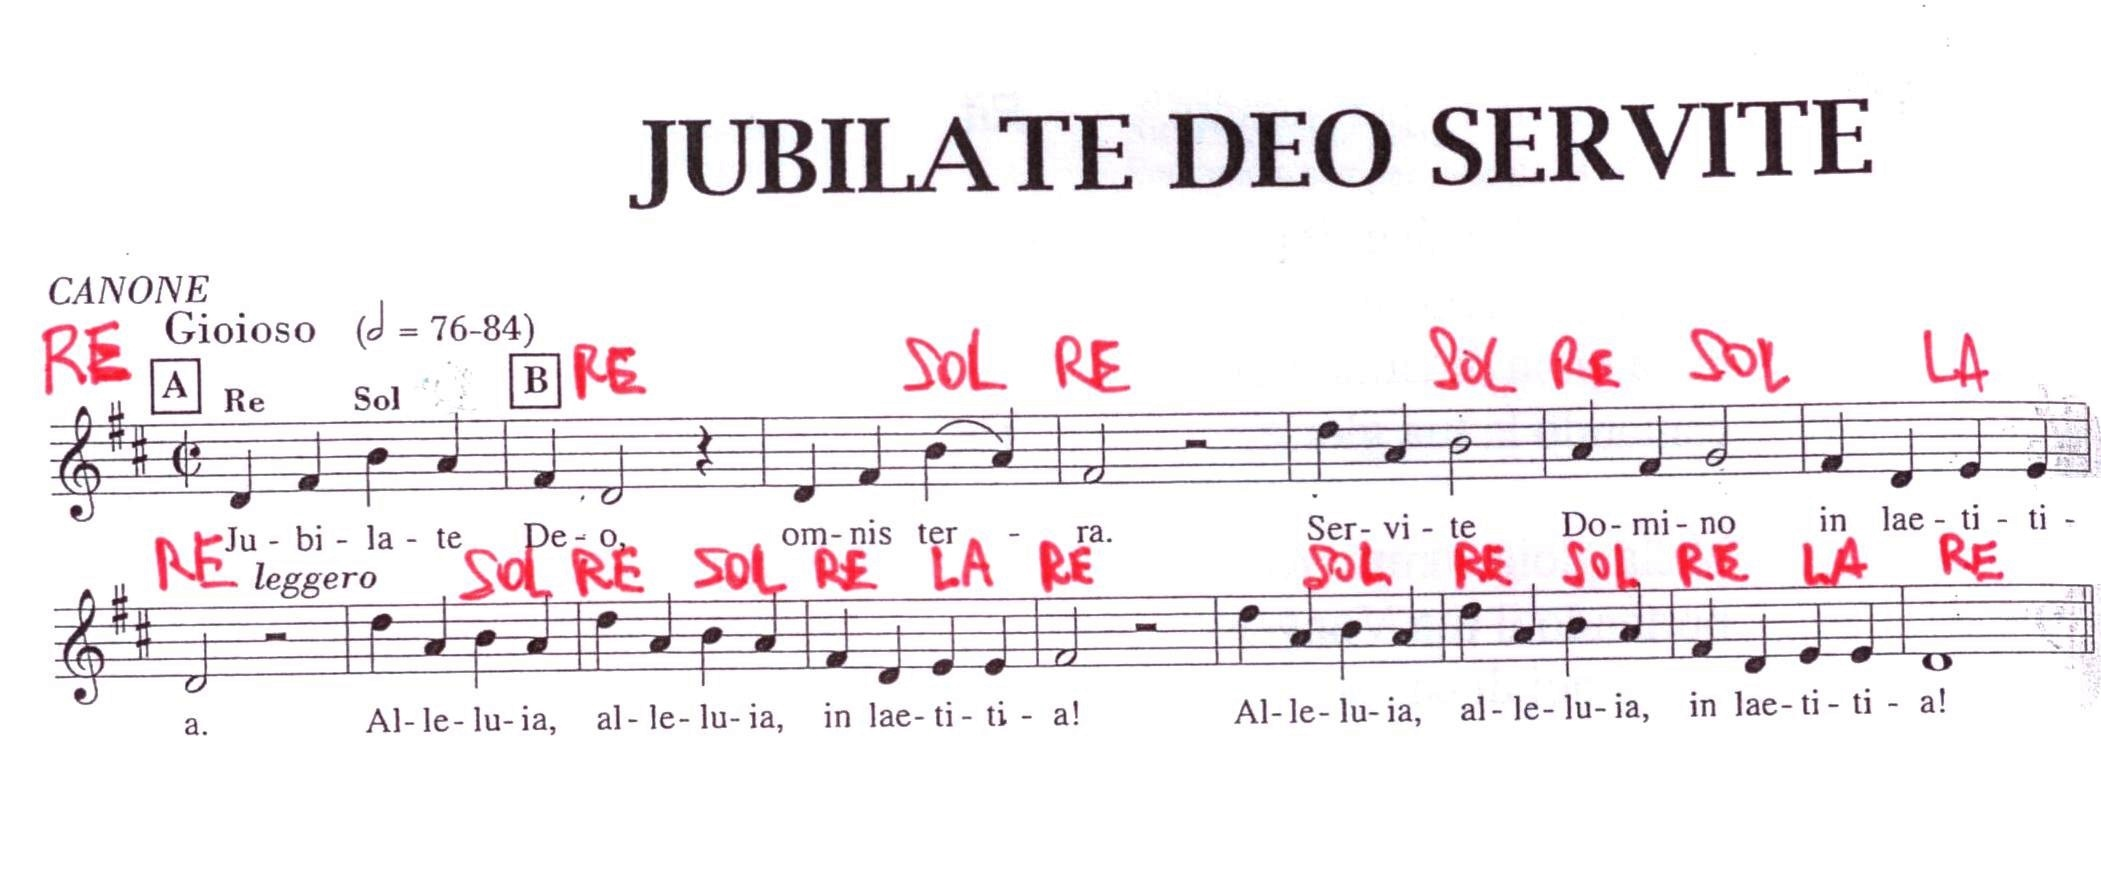 Jubilate Deo - Atuttascuola